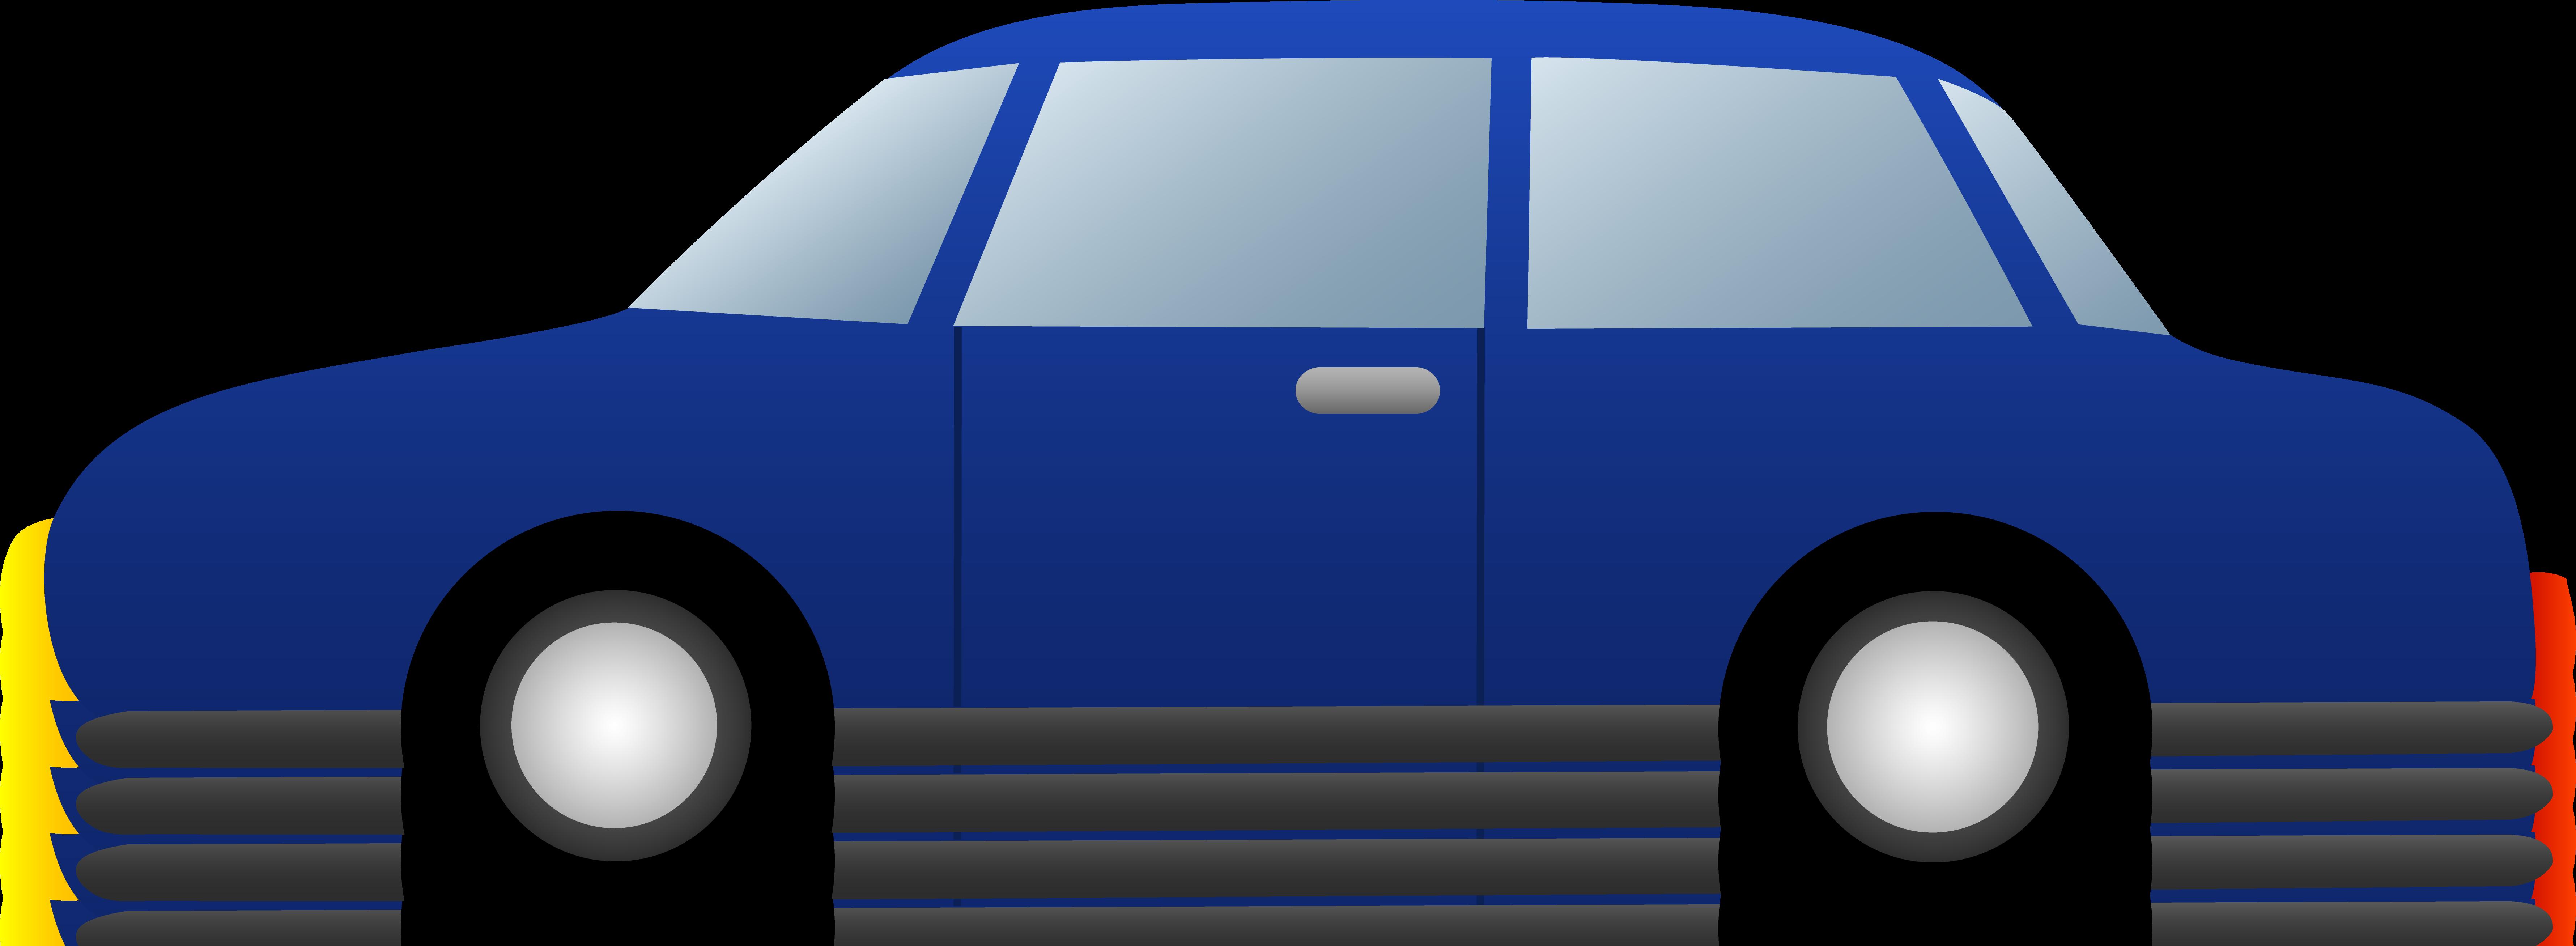 7122x2615 Free Clip Art Car